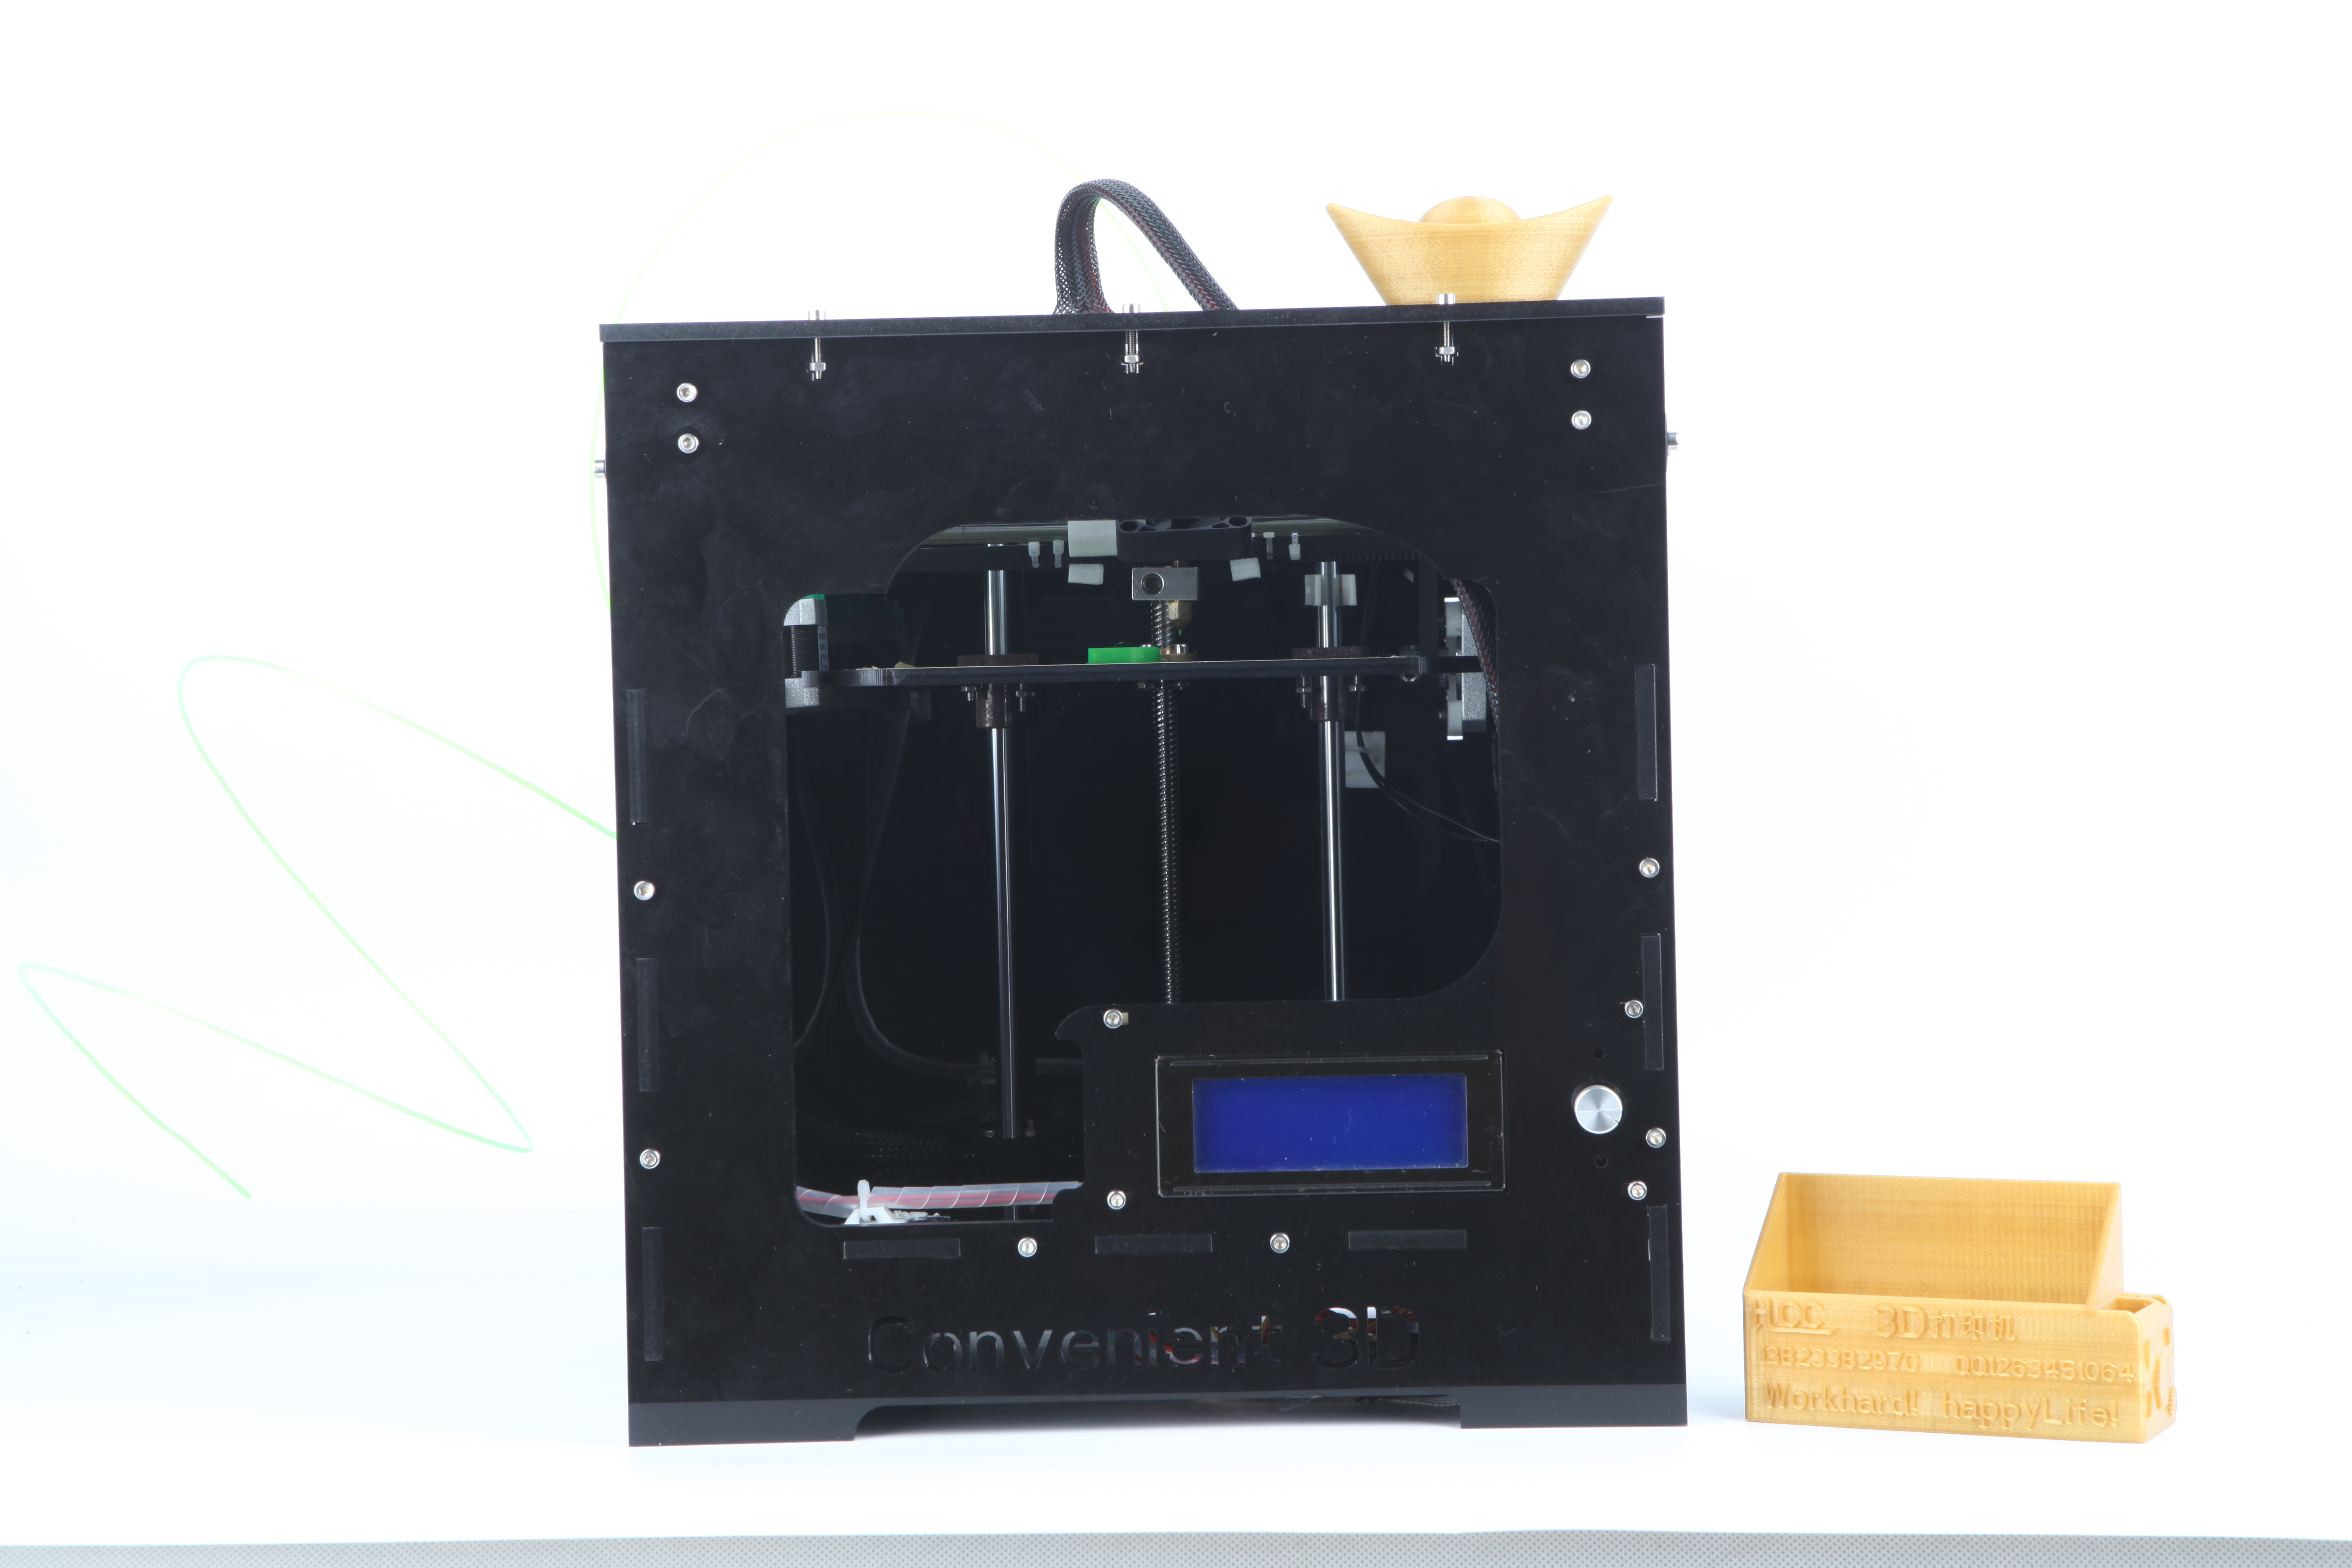 3D打印机图片/3D打印机样板图 (1)